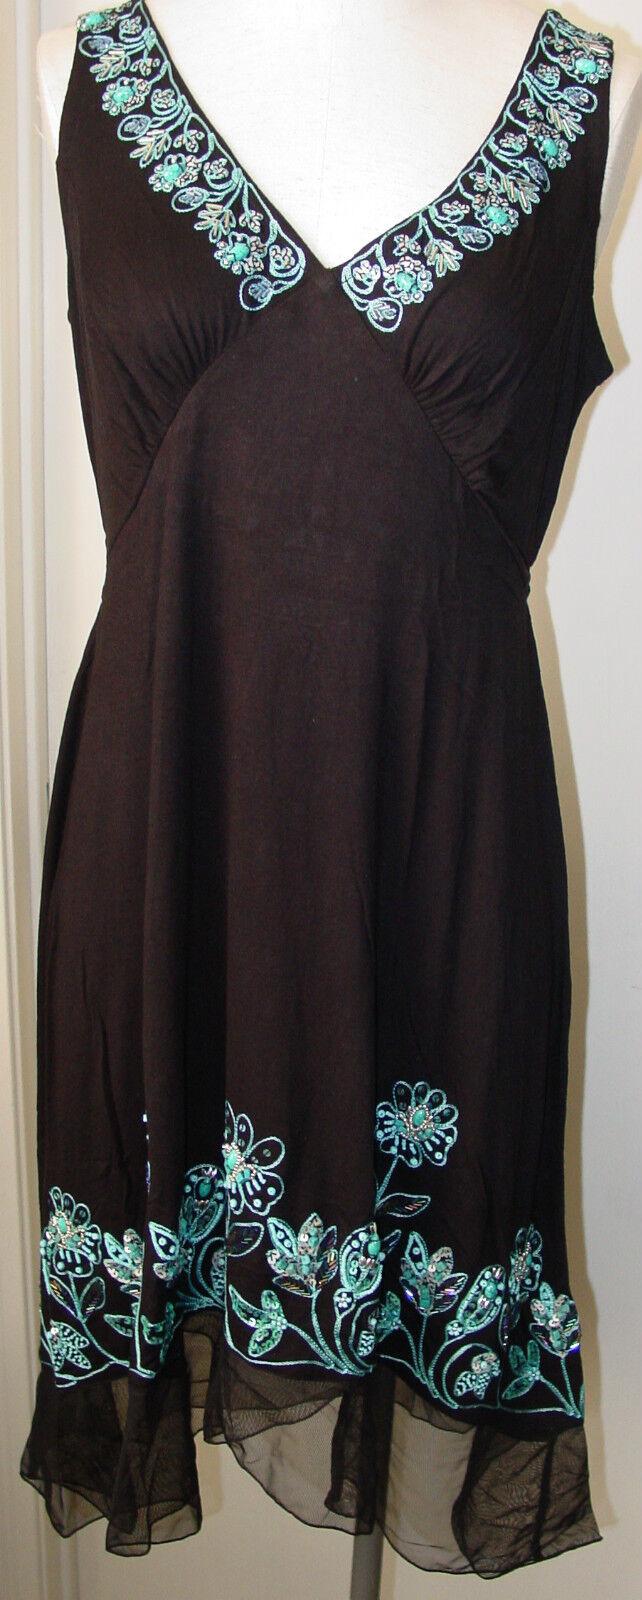 Femme Robe Noir Turquoise sans hommeches Réservoir Krista Lee MONTEGO BAY broderie